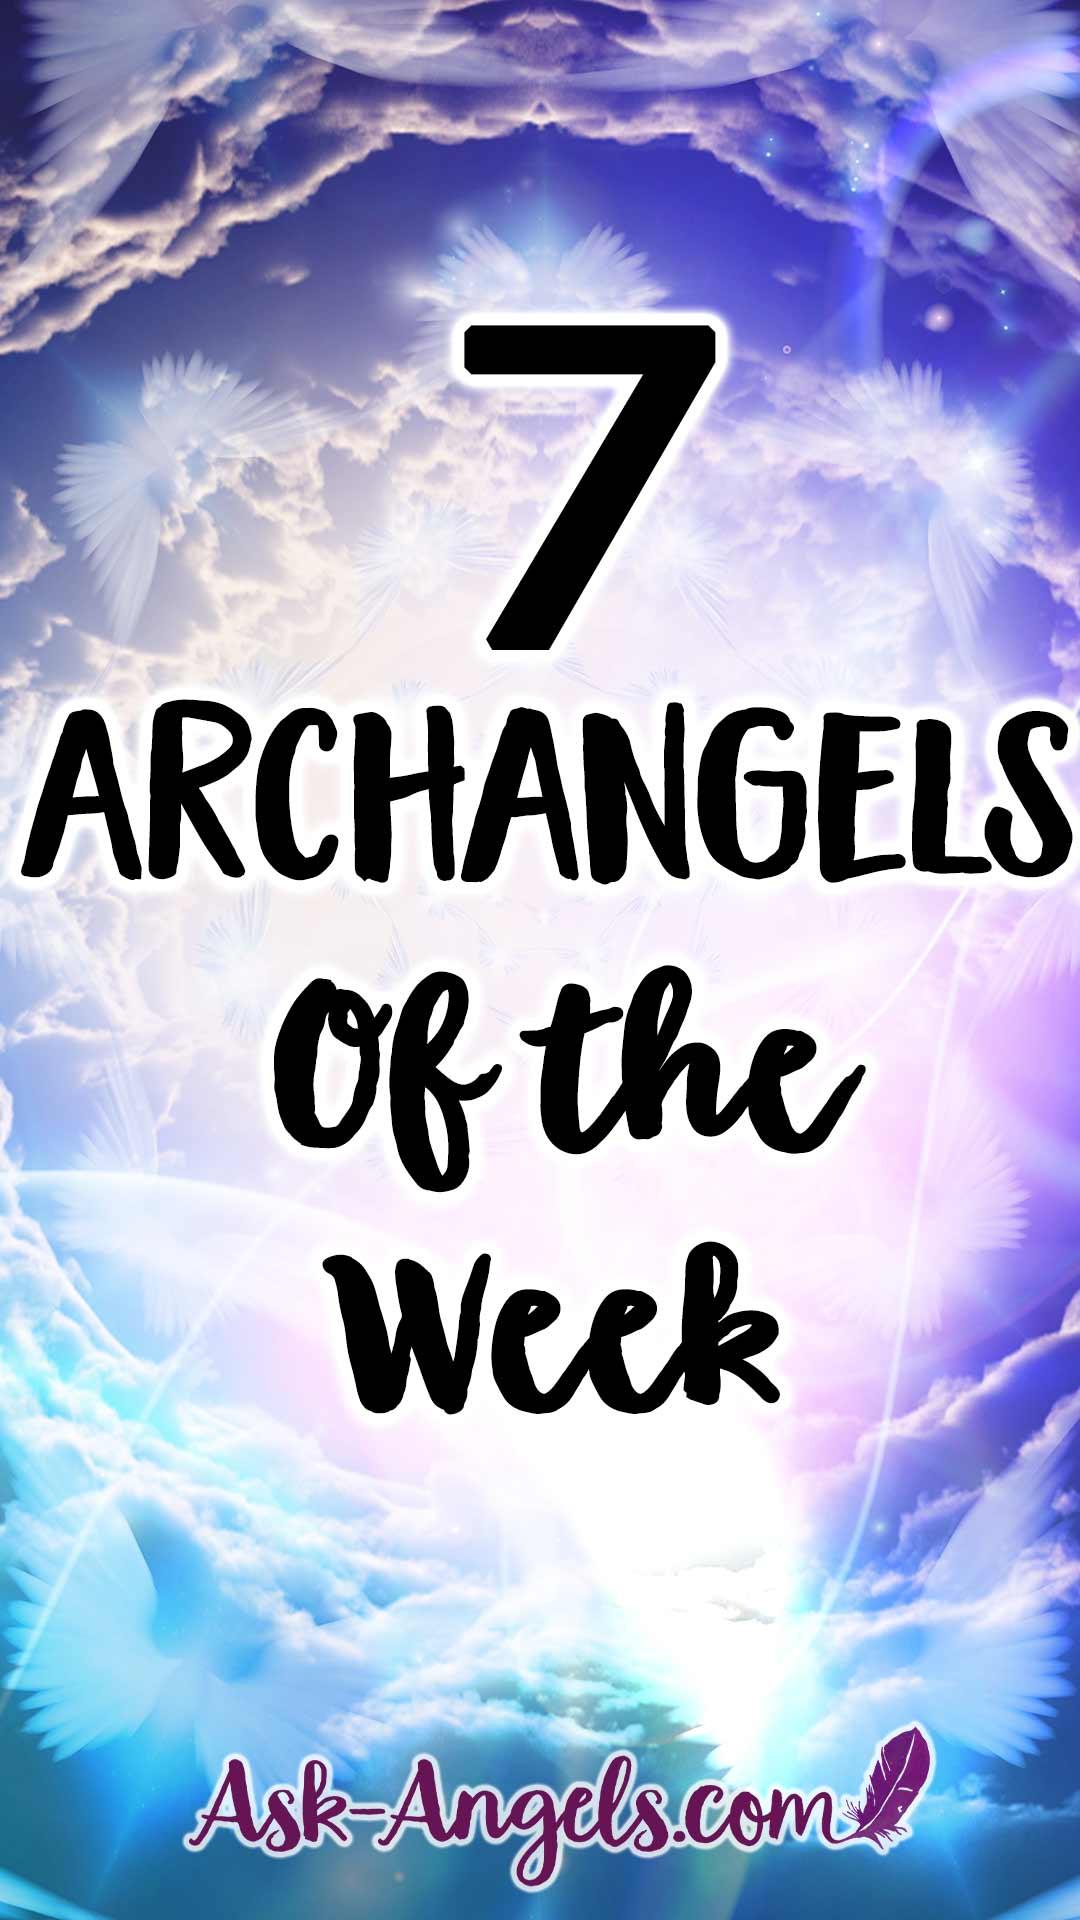 7 Archangels of the Week